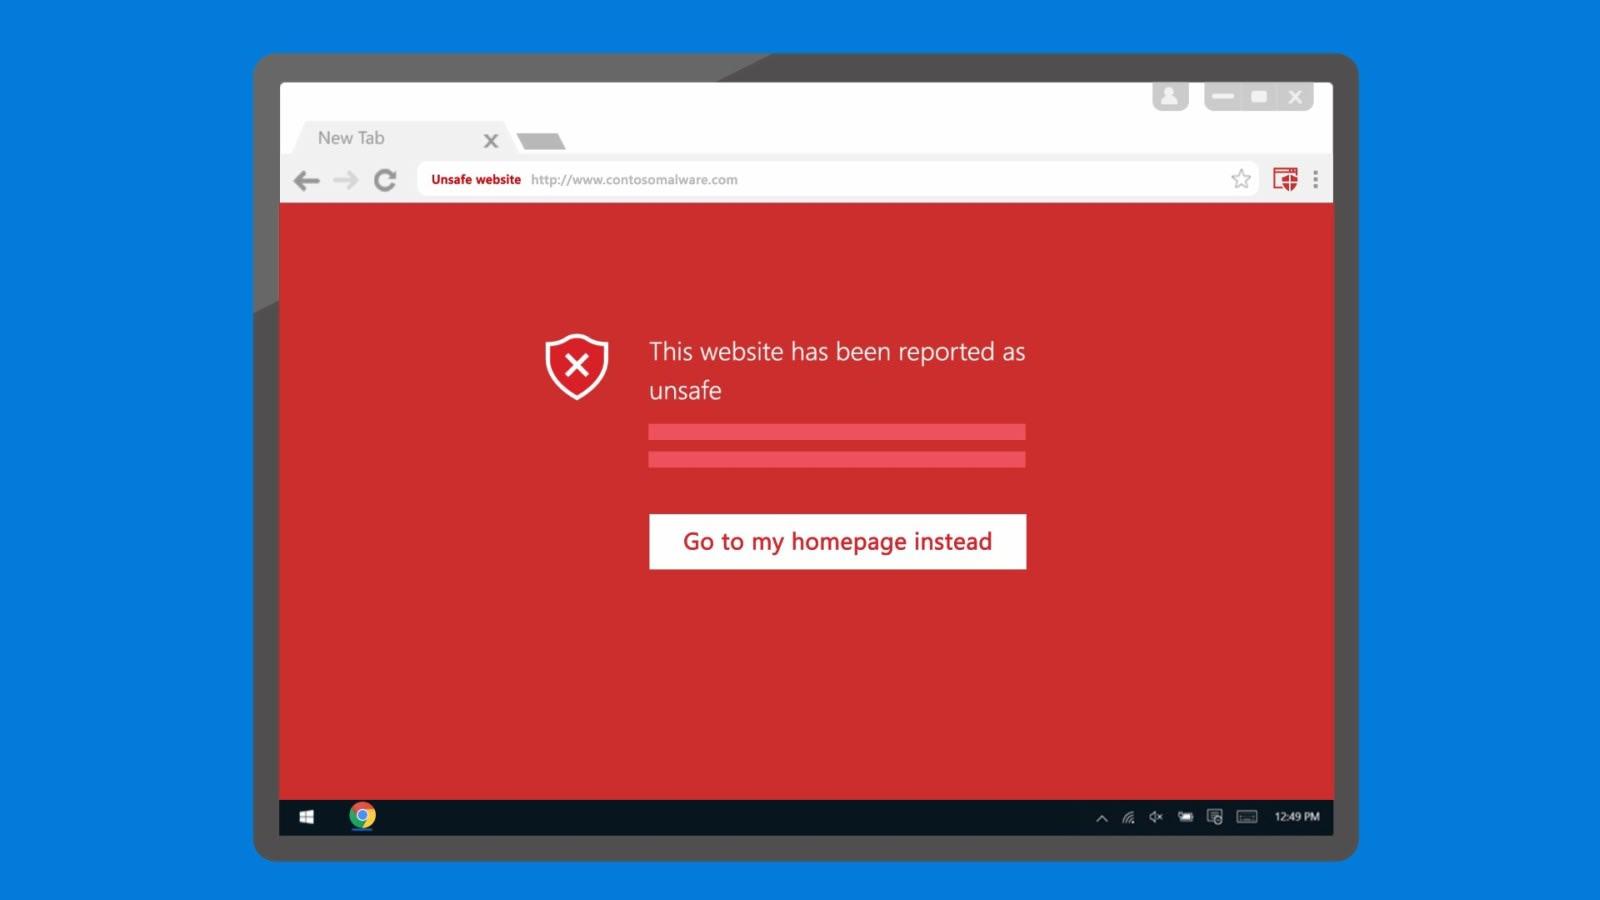 Microsoft's Chrome extension fights phishing attacks